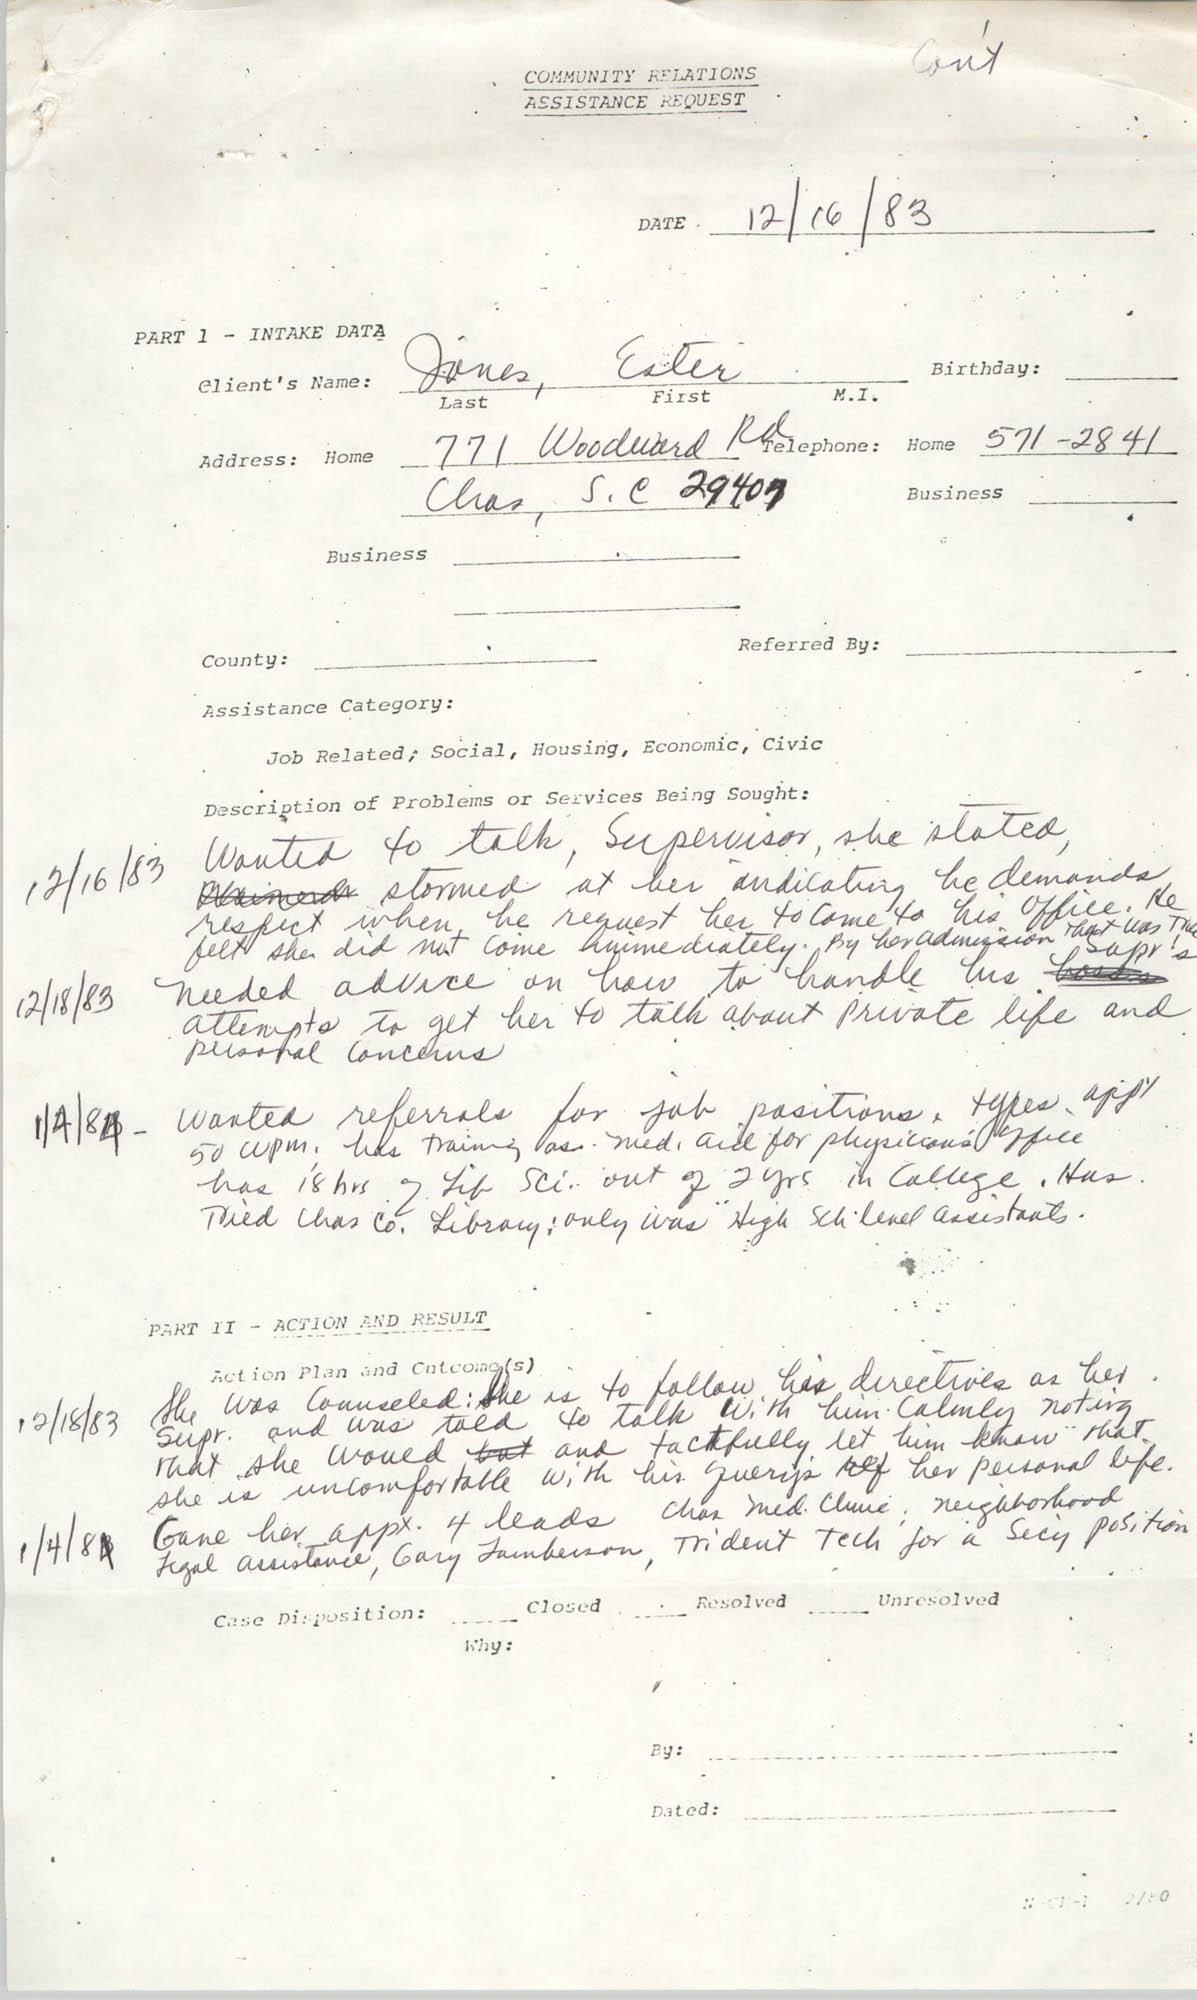 Community Relations Assistance Request, December 16, 1983